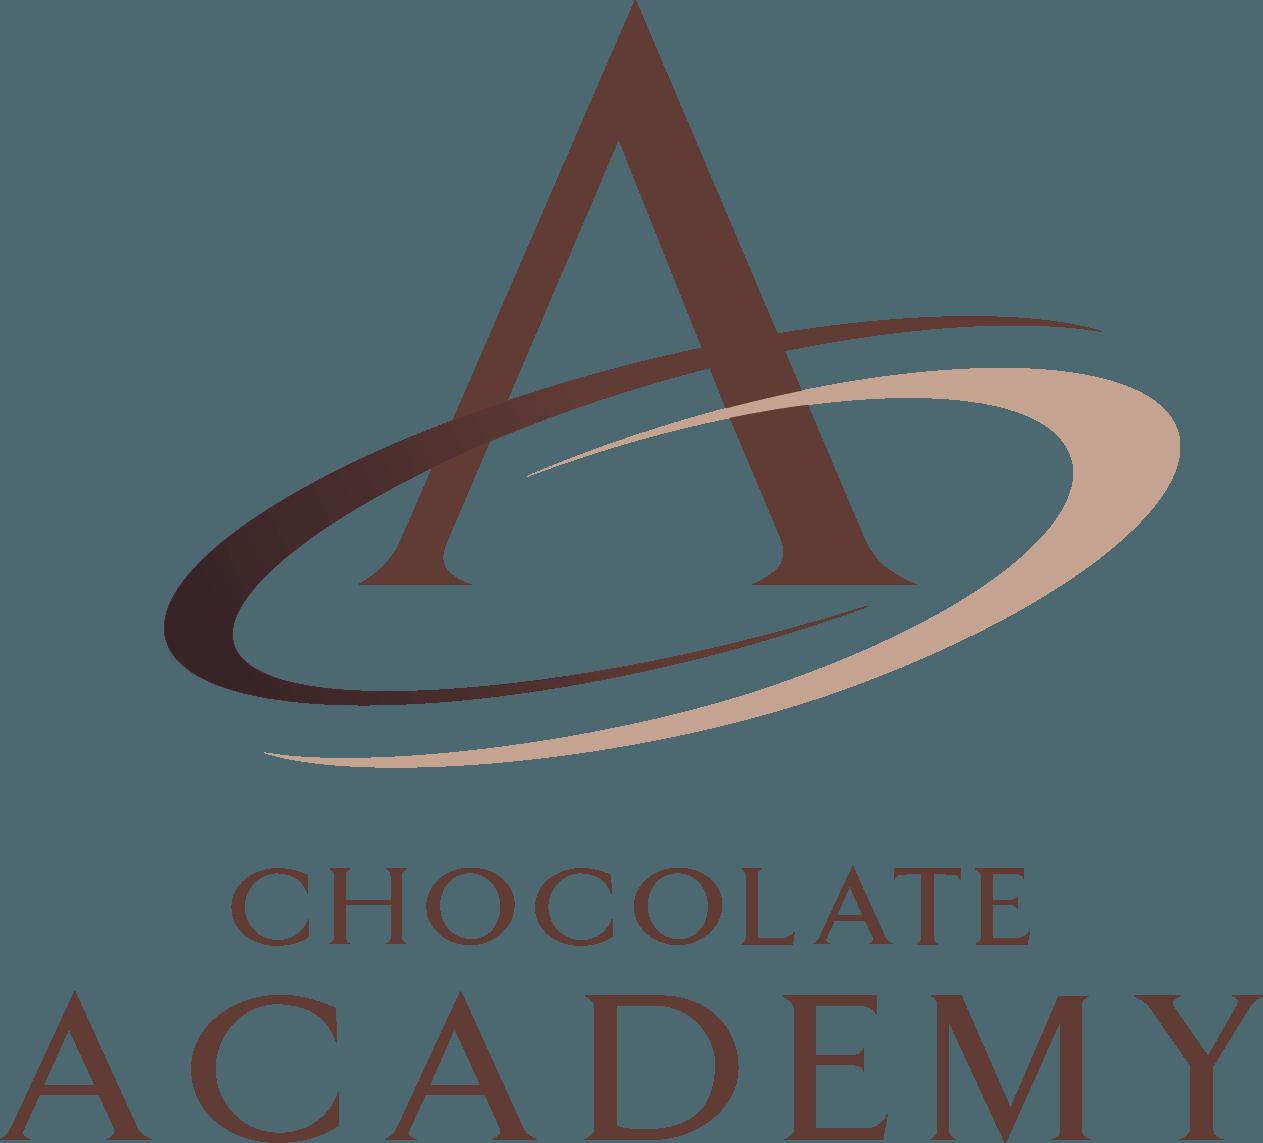 CHOCOLATE ACADEMY™